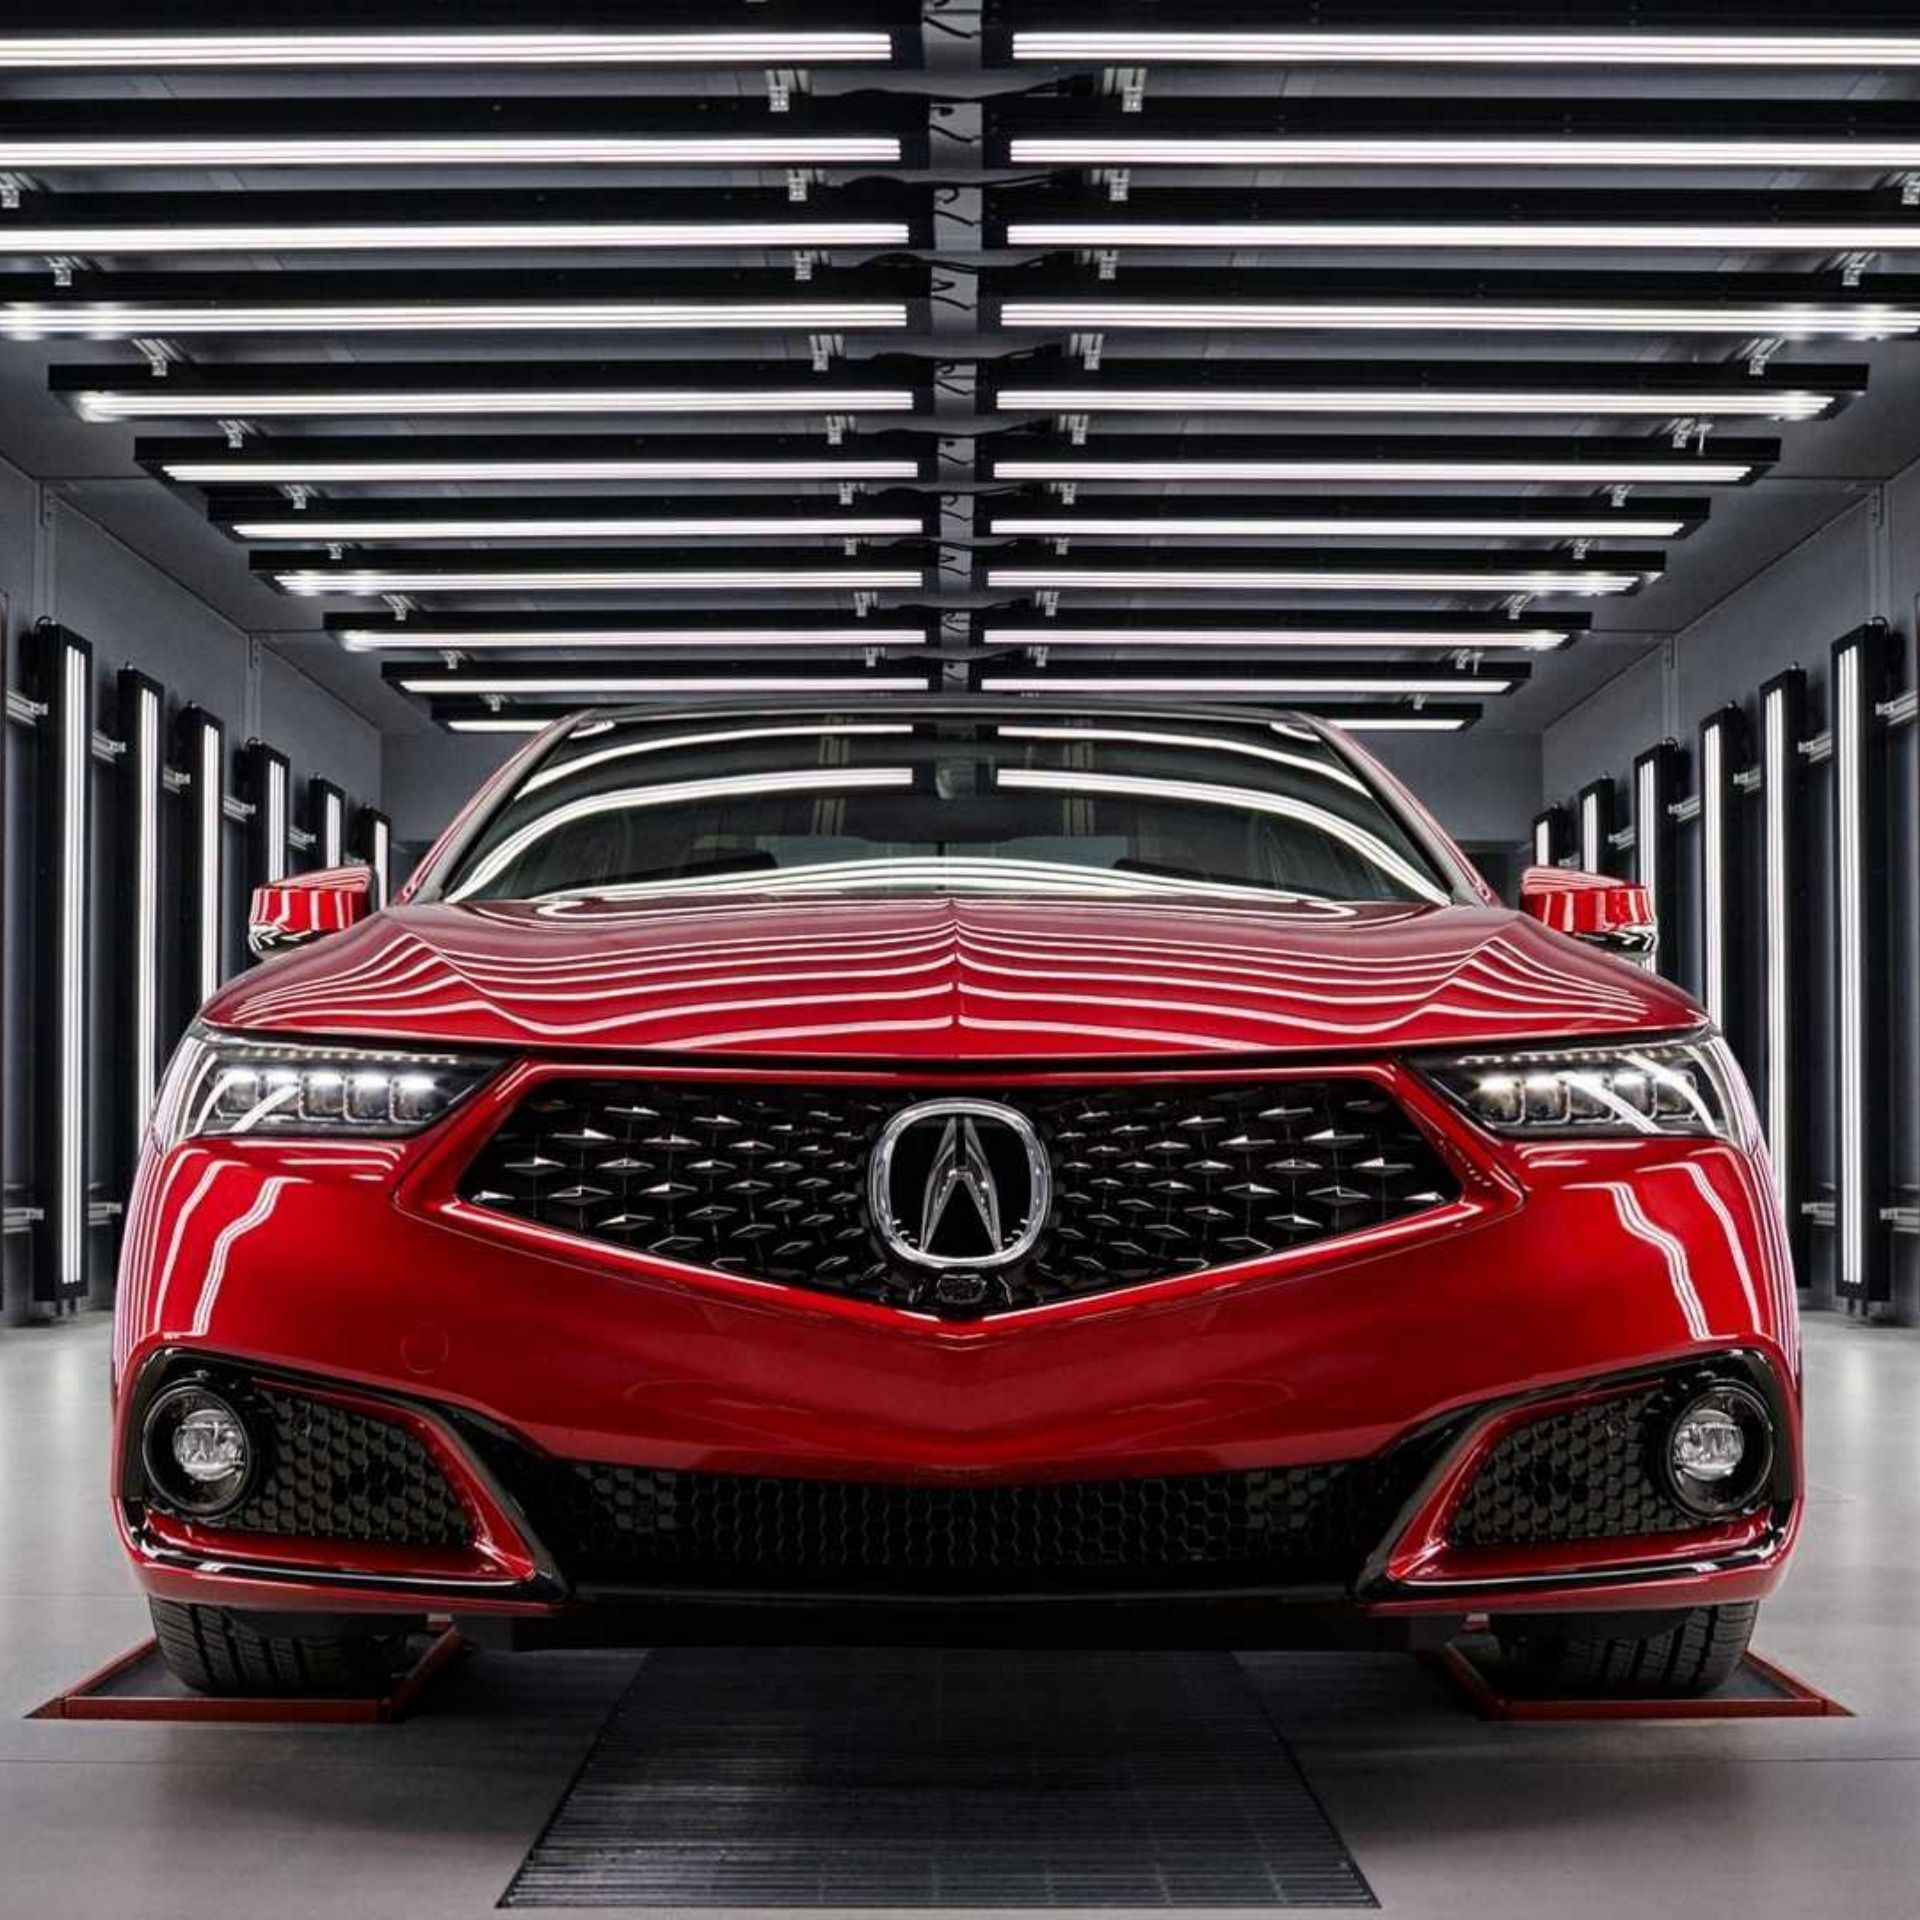 Acura Tlx, Acura, Sports Car